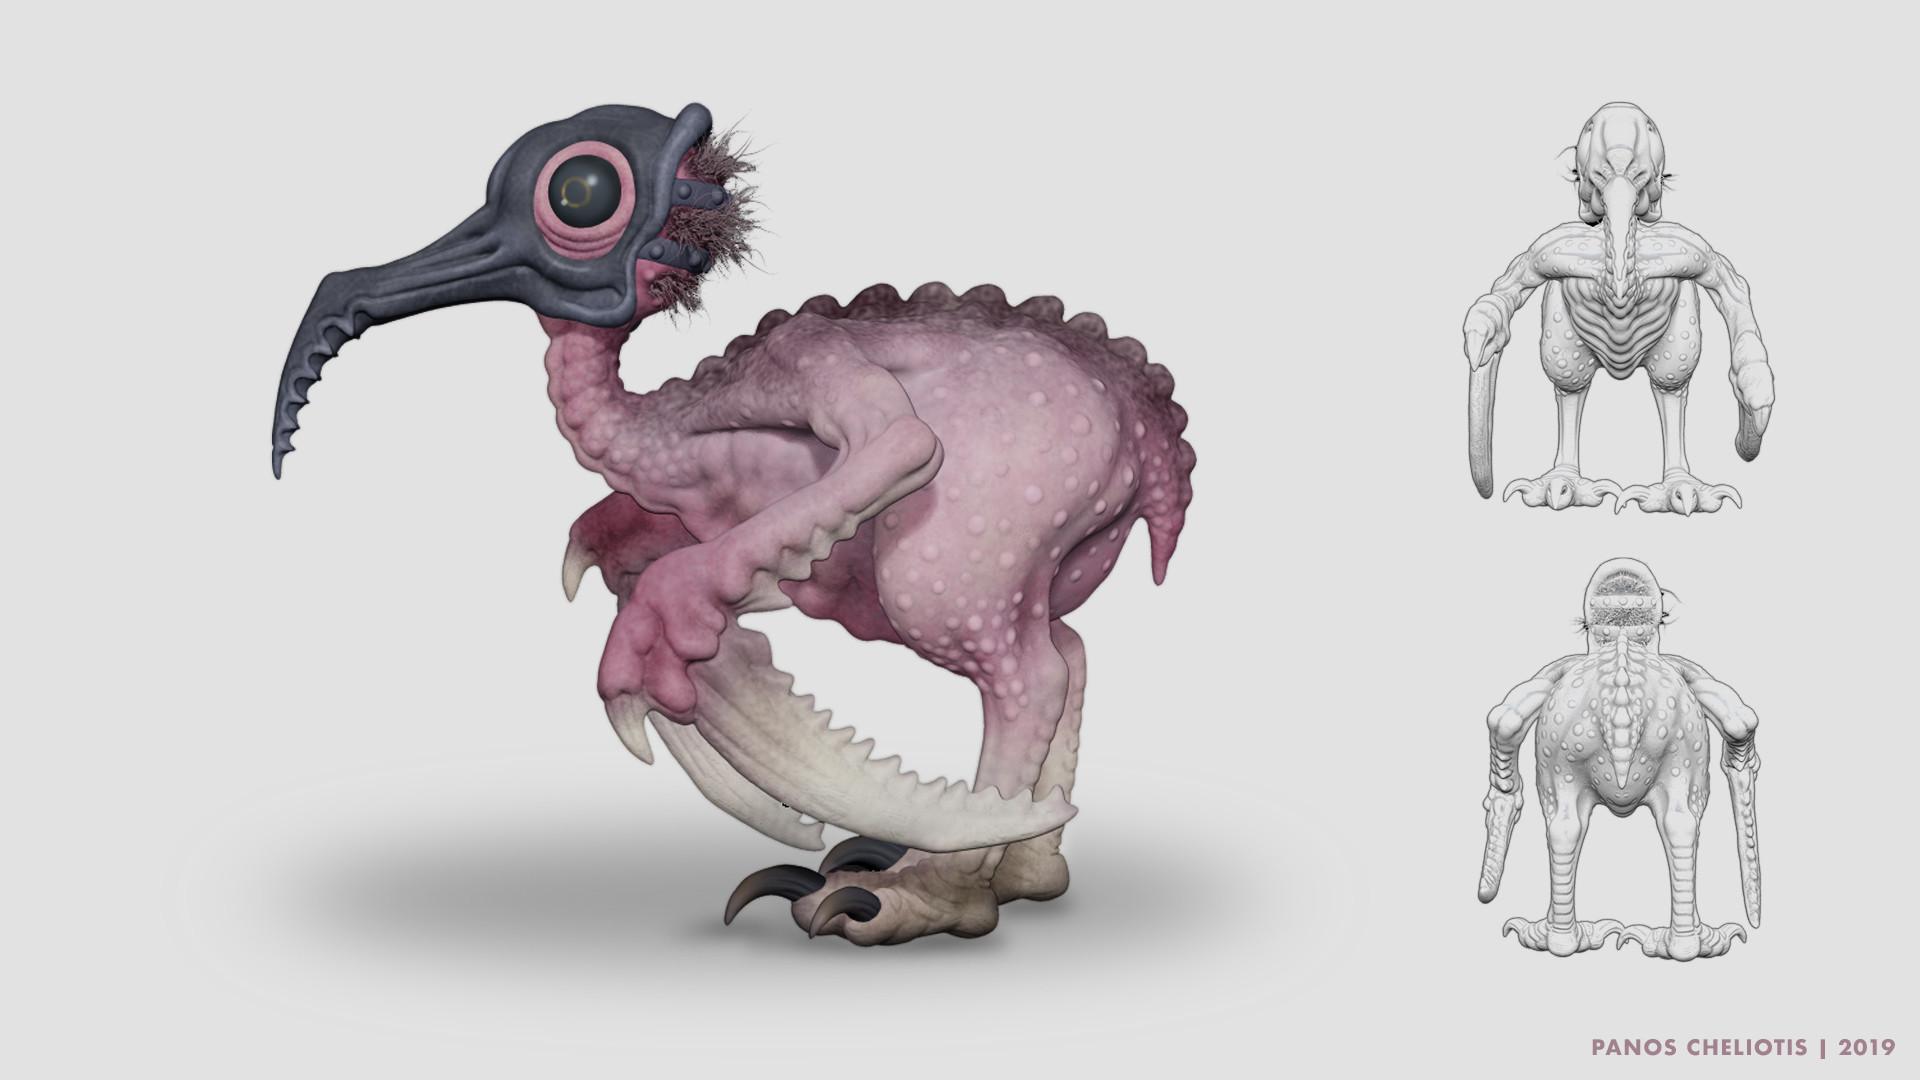 Panos cheliotis ornivore concept